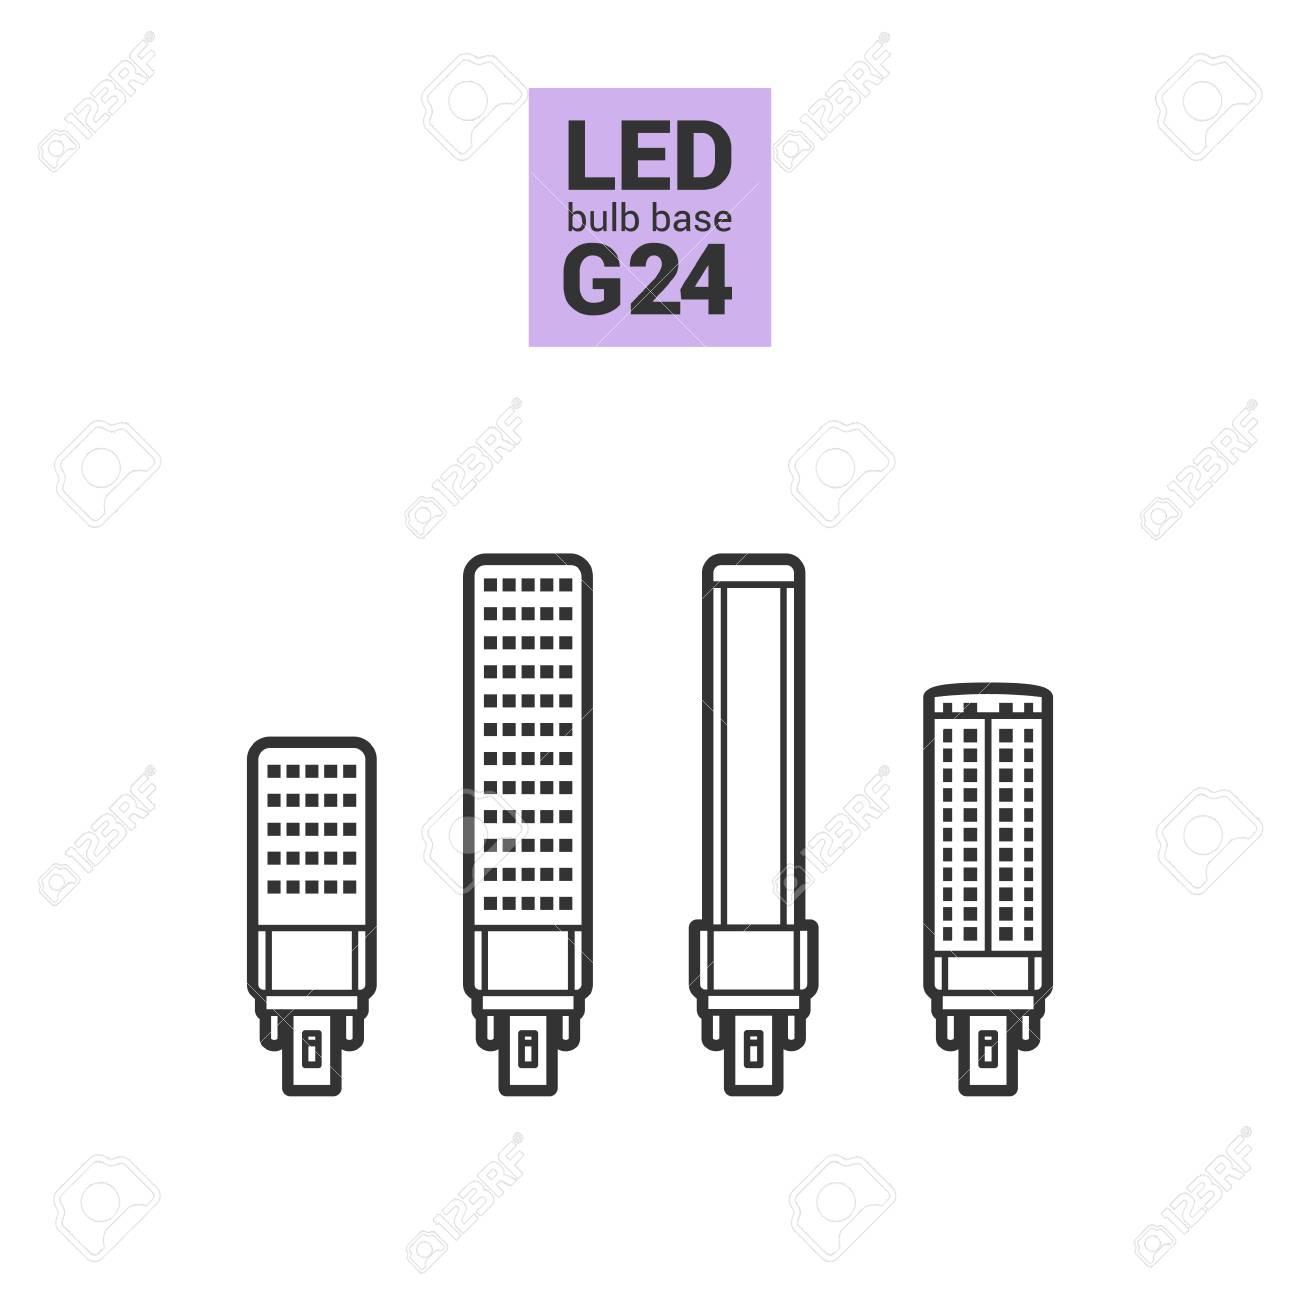 Lampadine Led G24.Led Light Bulbs With G24 Base Vector Outline Icon Set On White